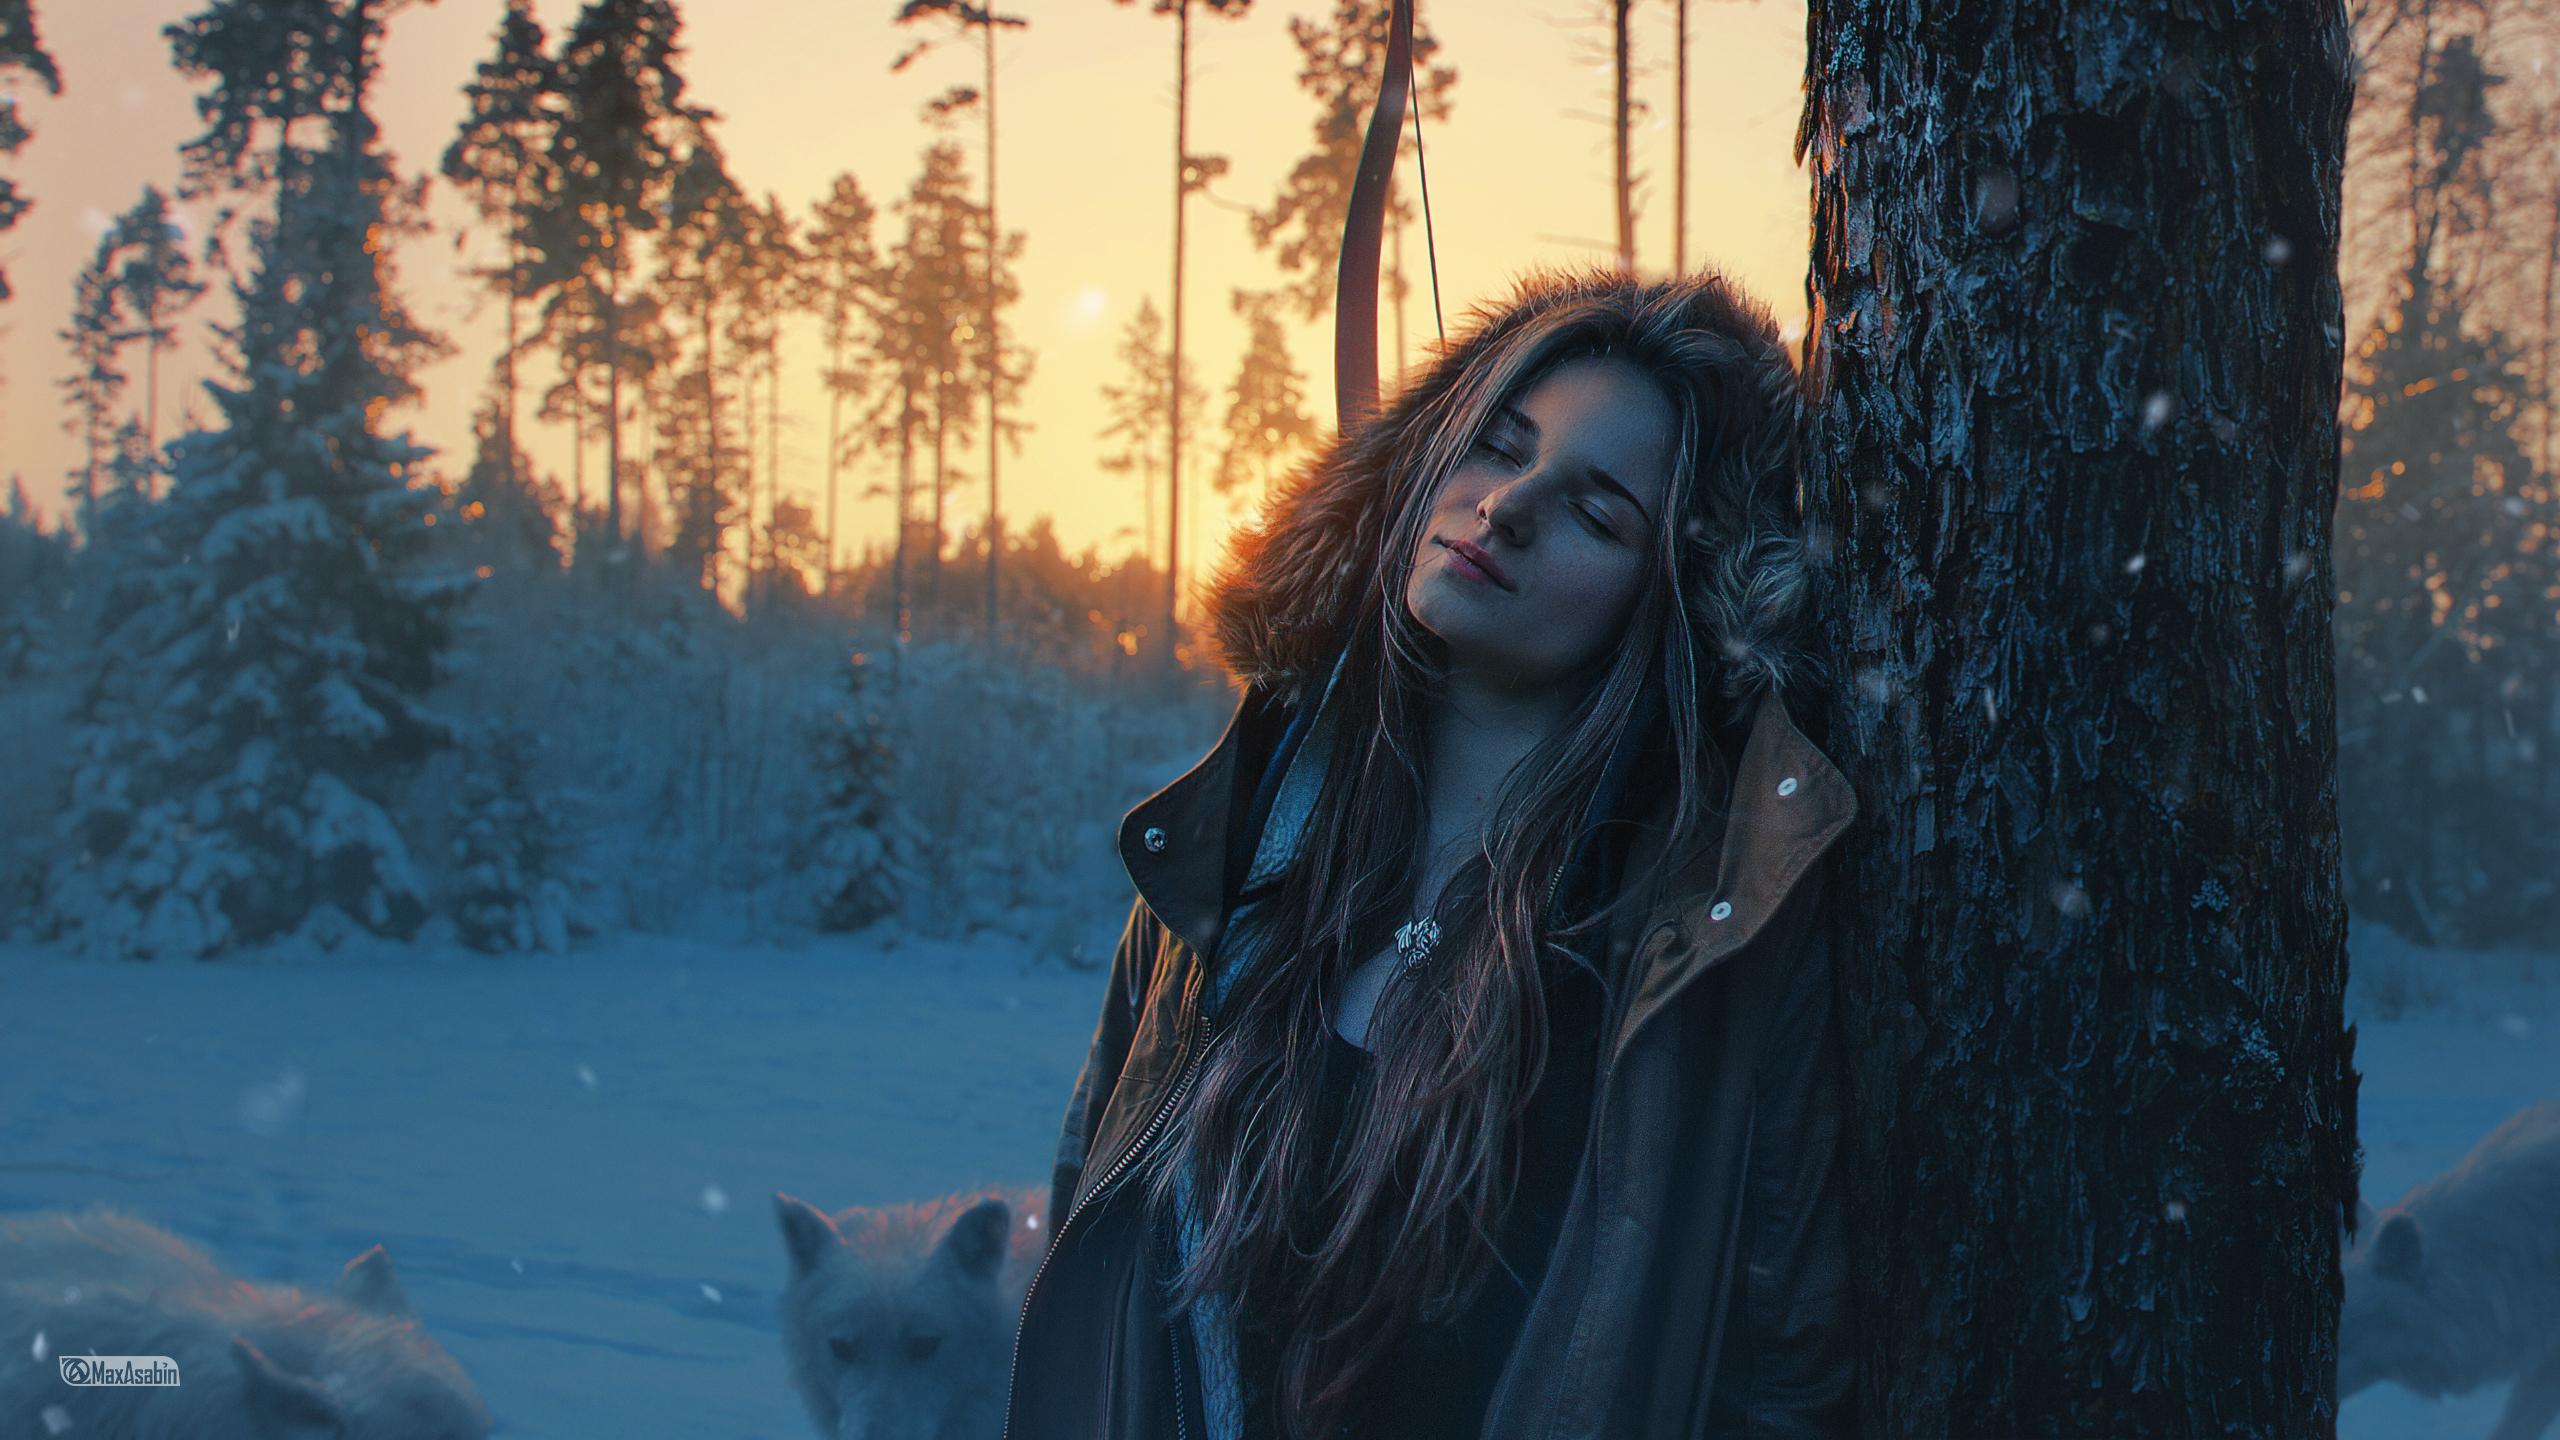 People 2560x1440 photography retouching digital art artwork Photoshop women women outdoors Sun sunset dusk wolf wood trees forest animals landscape model hoods brown jacket open jacket coats